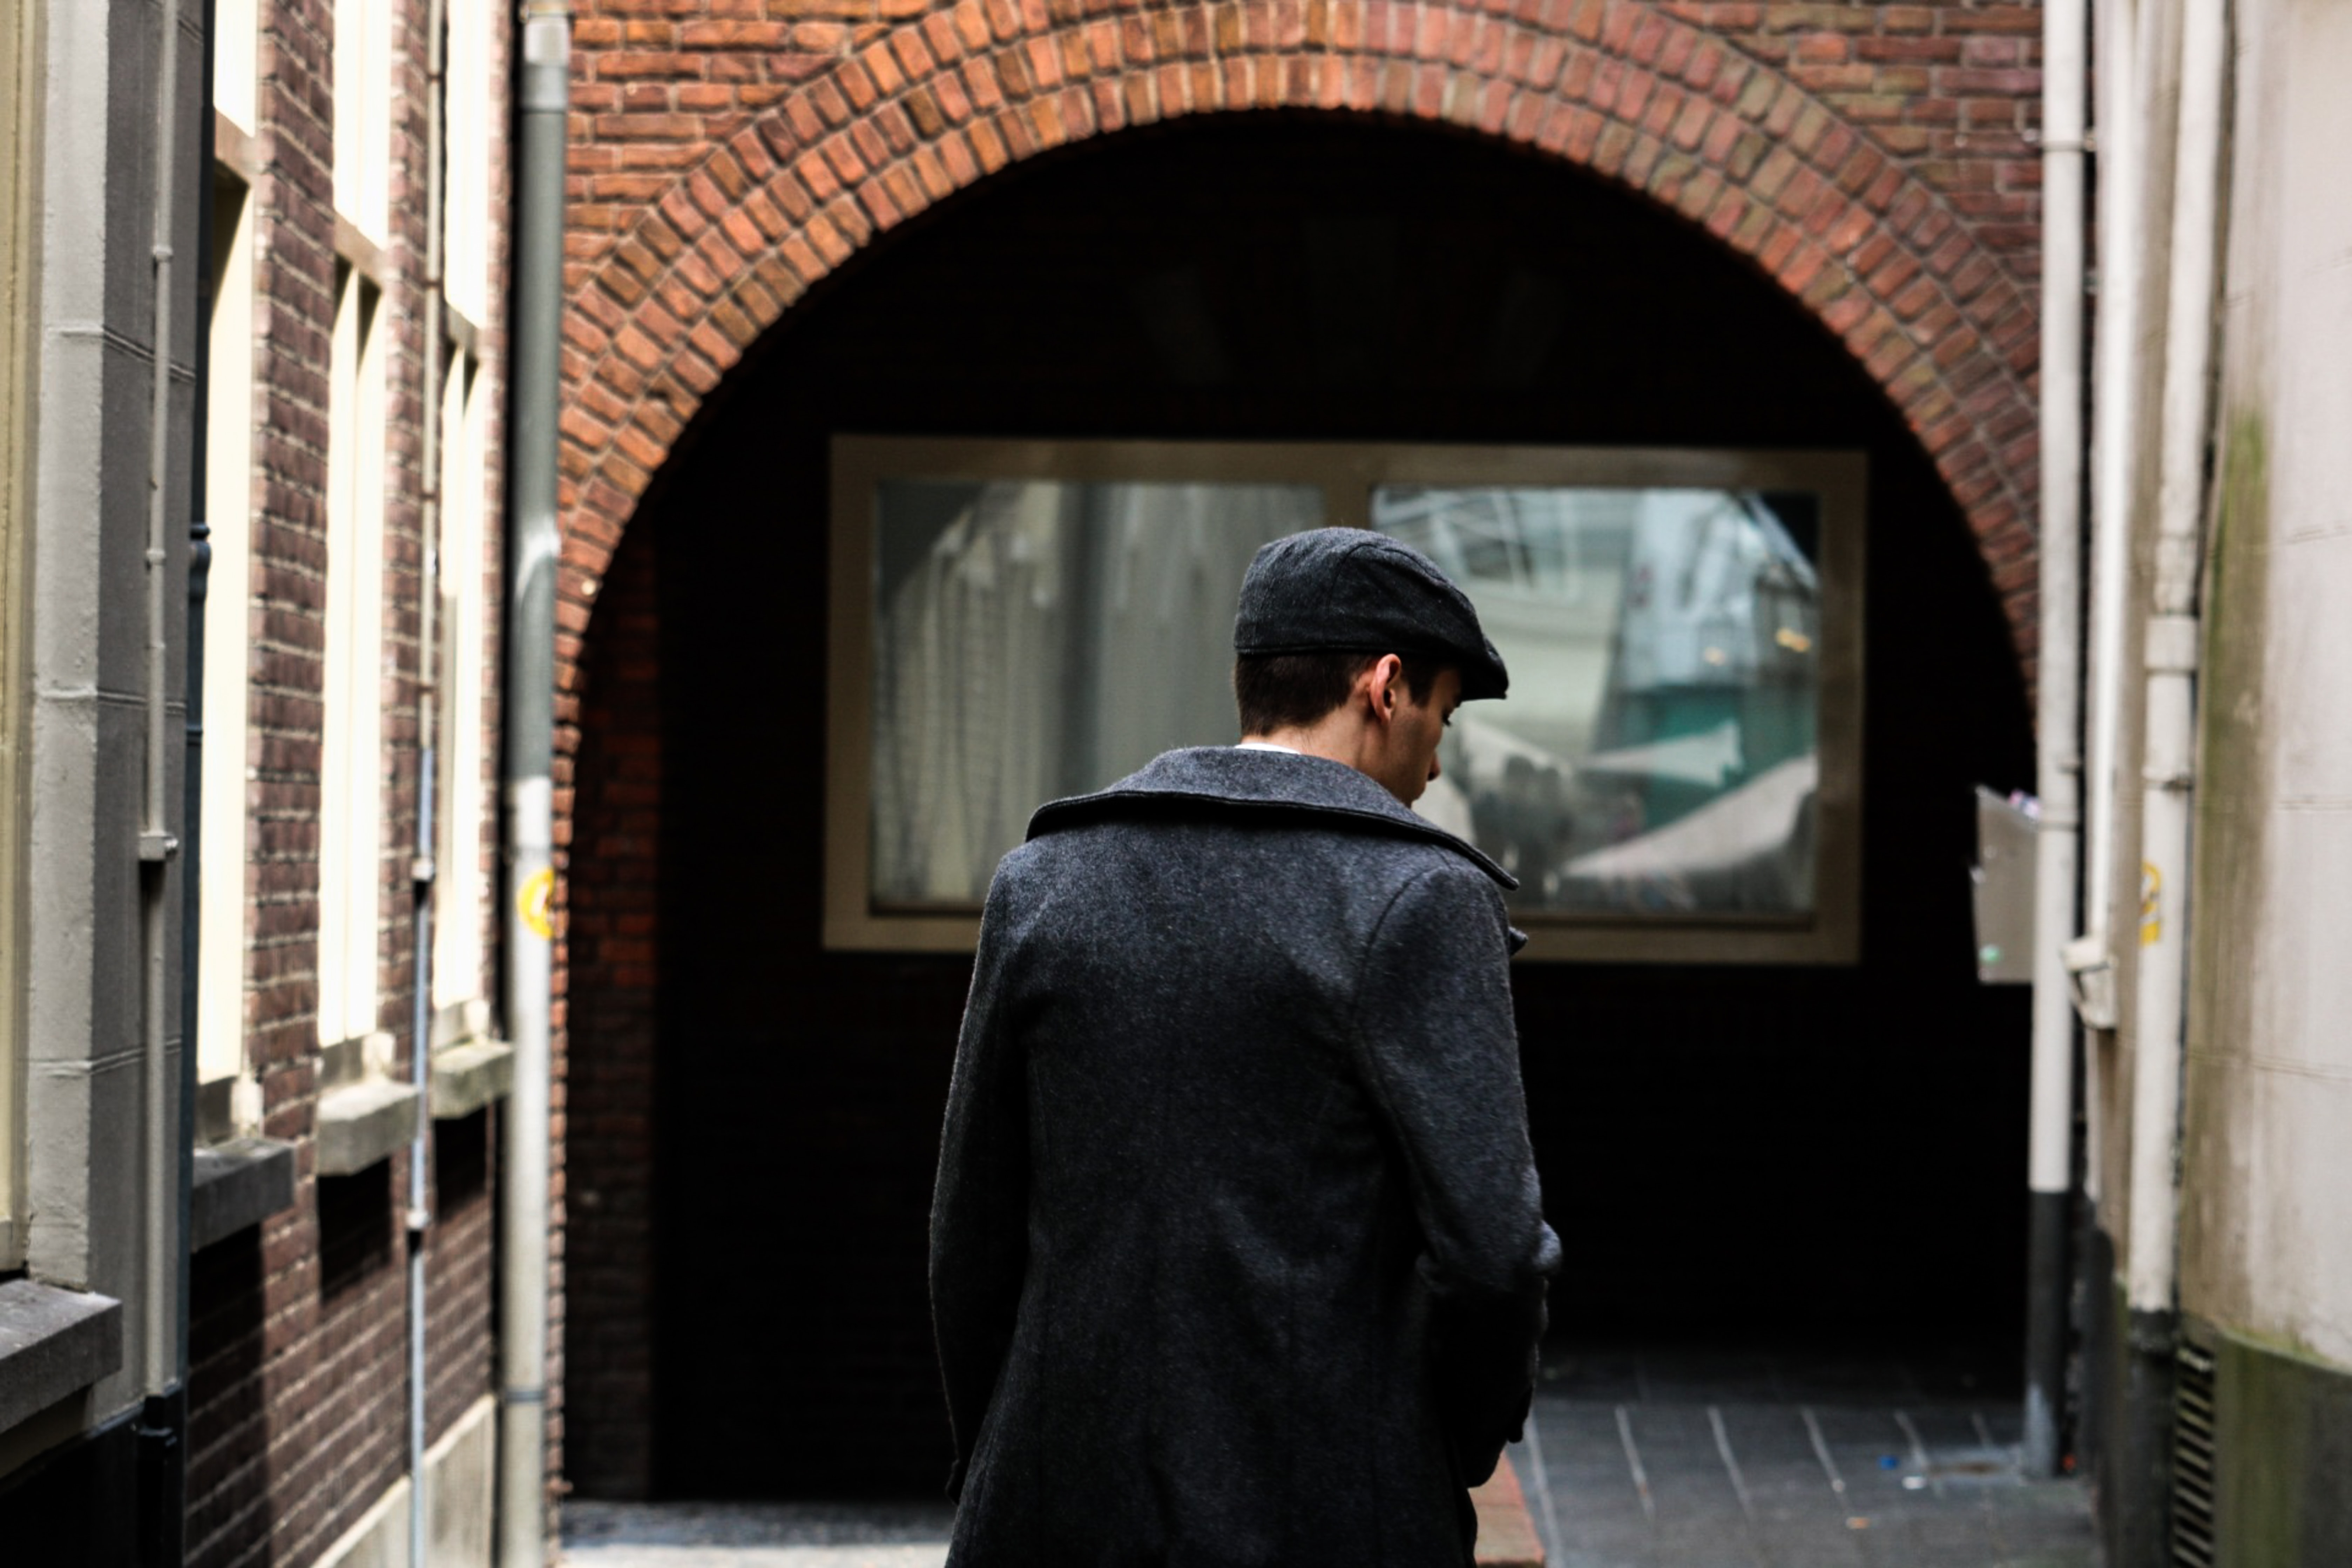 person walking on street near white building